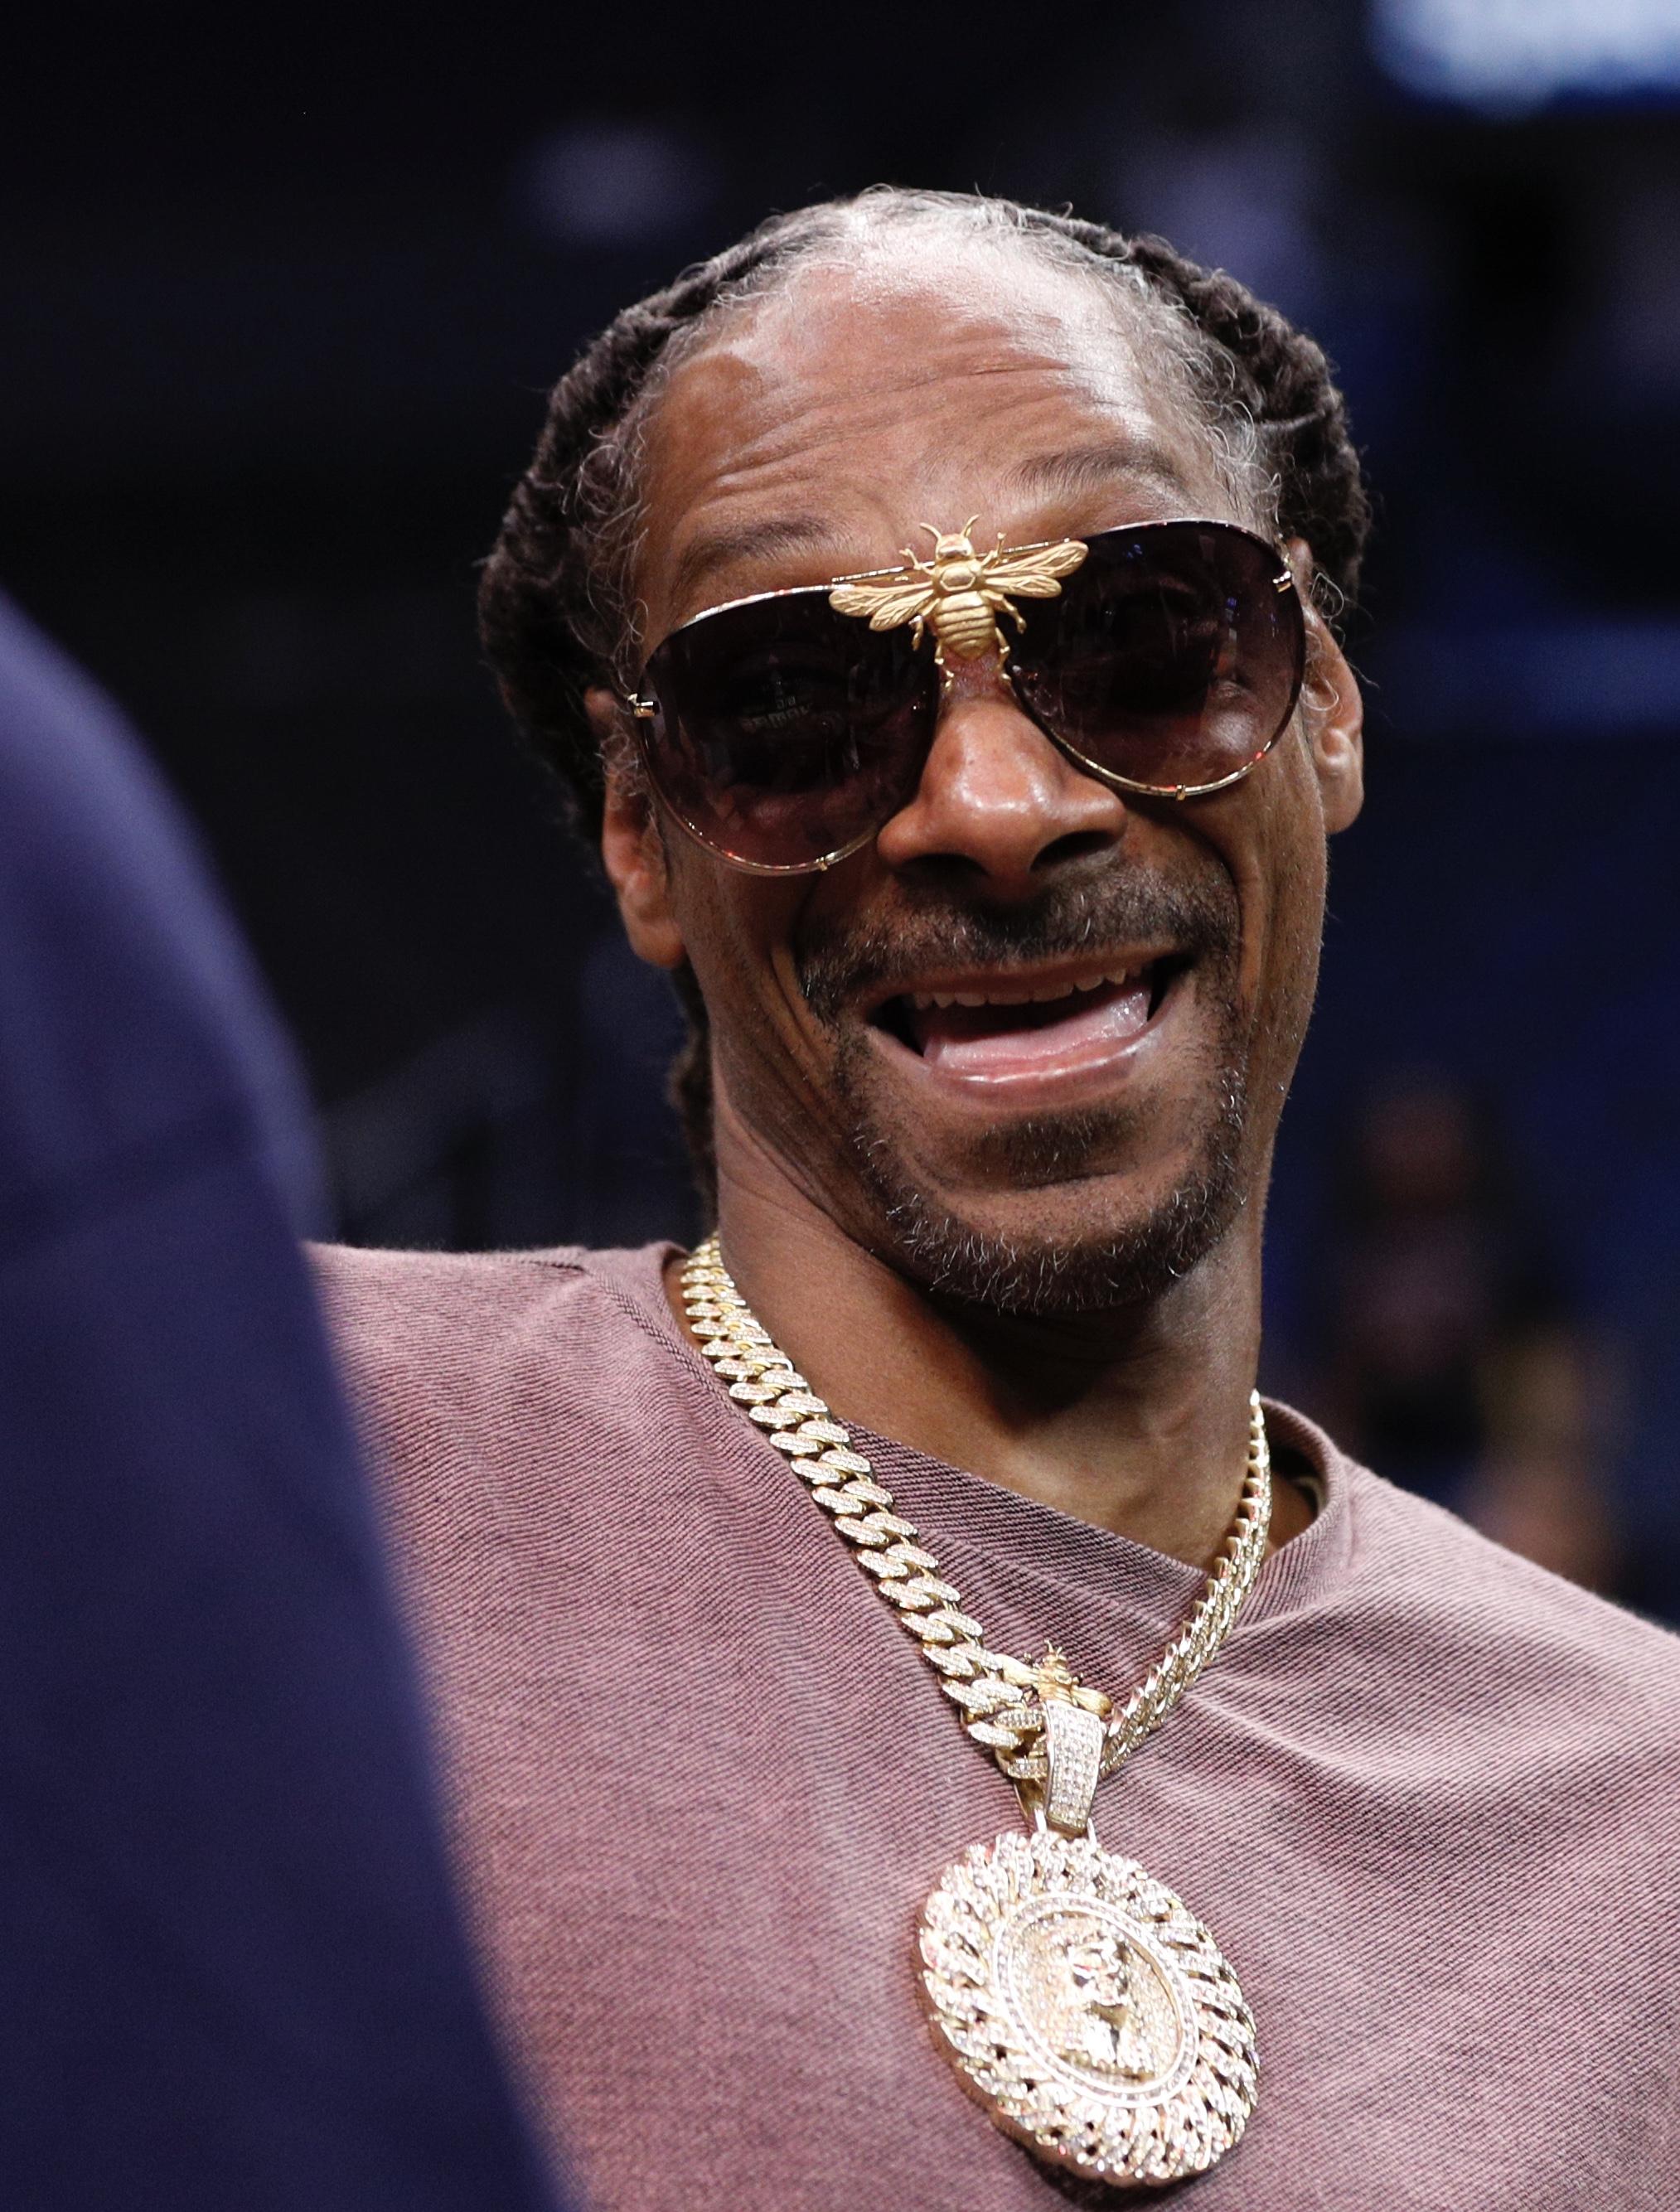 Snoop Dogg Performs at University of Kansas